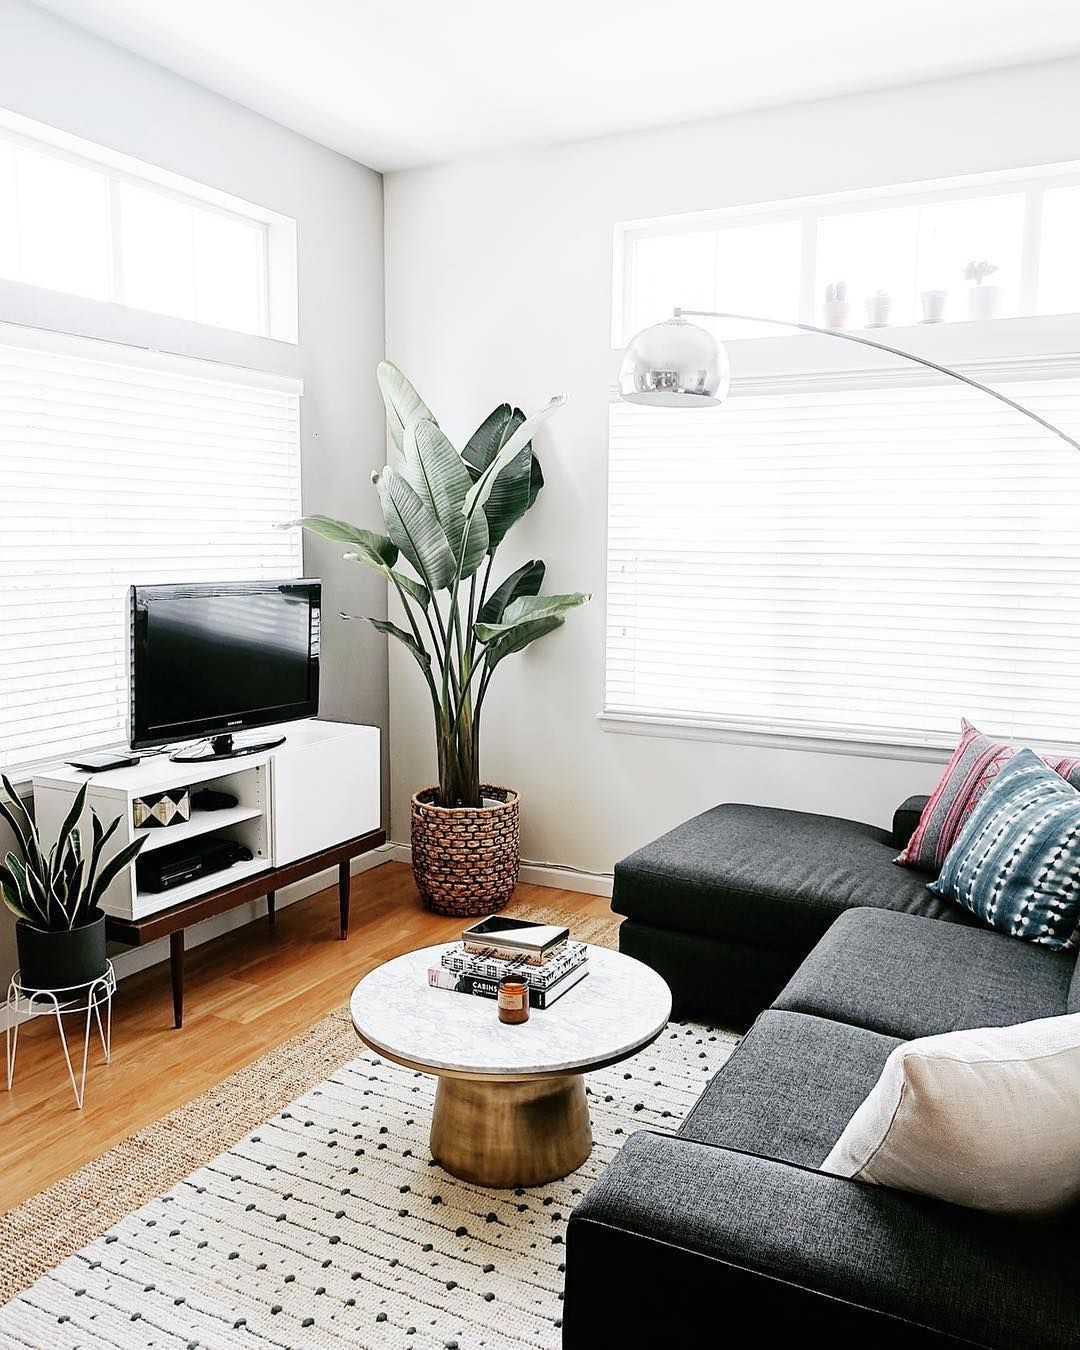 12 furniture stores like ikea to buy minimalist home decor